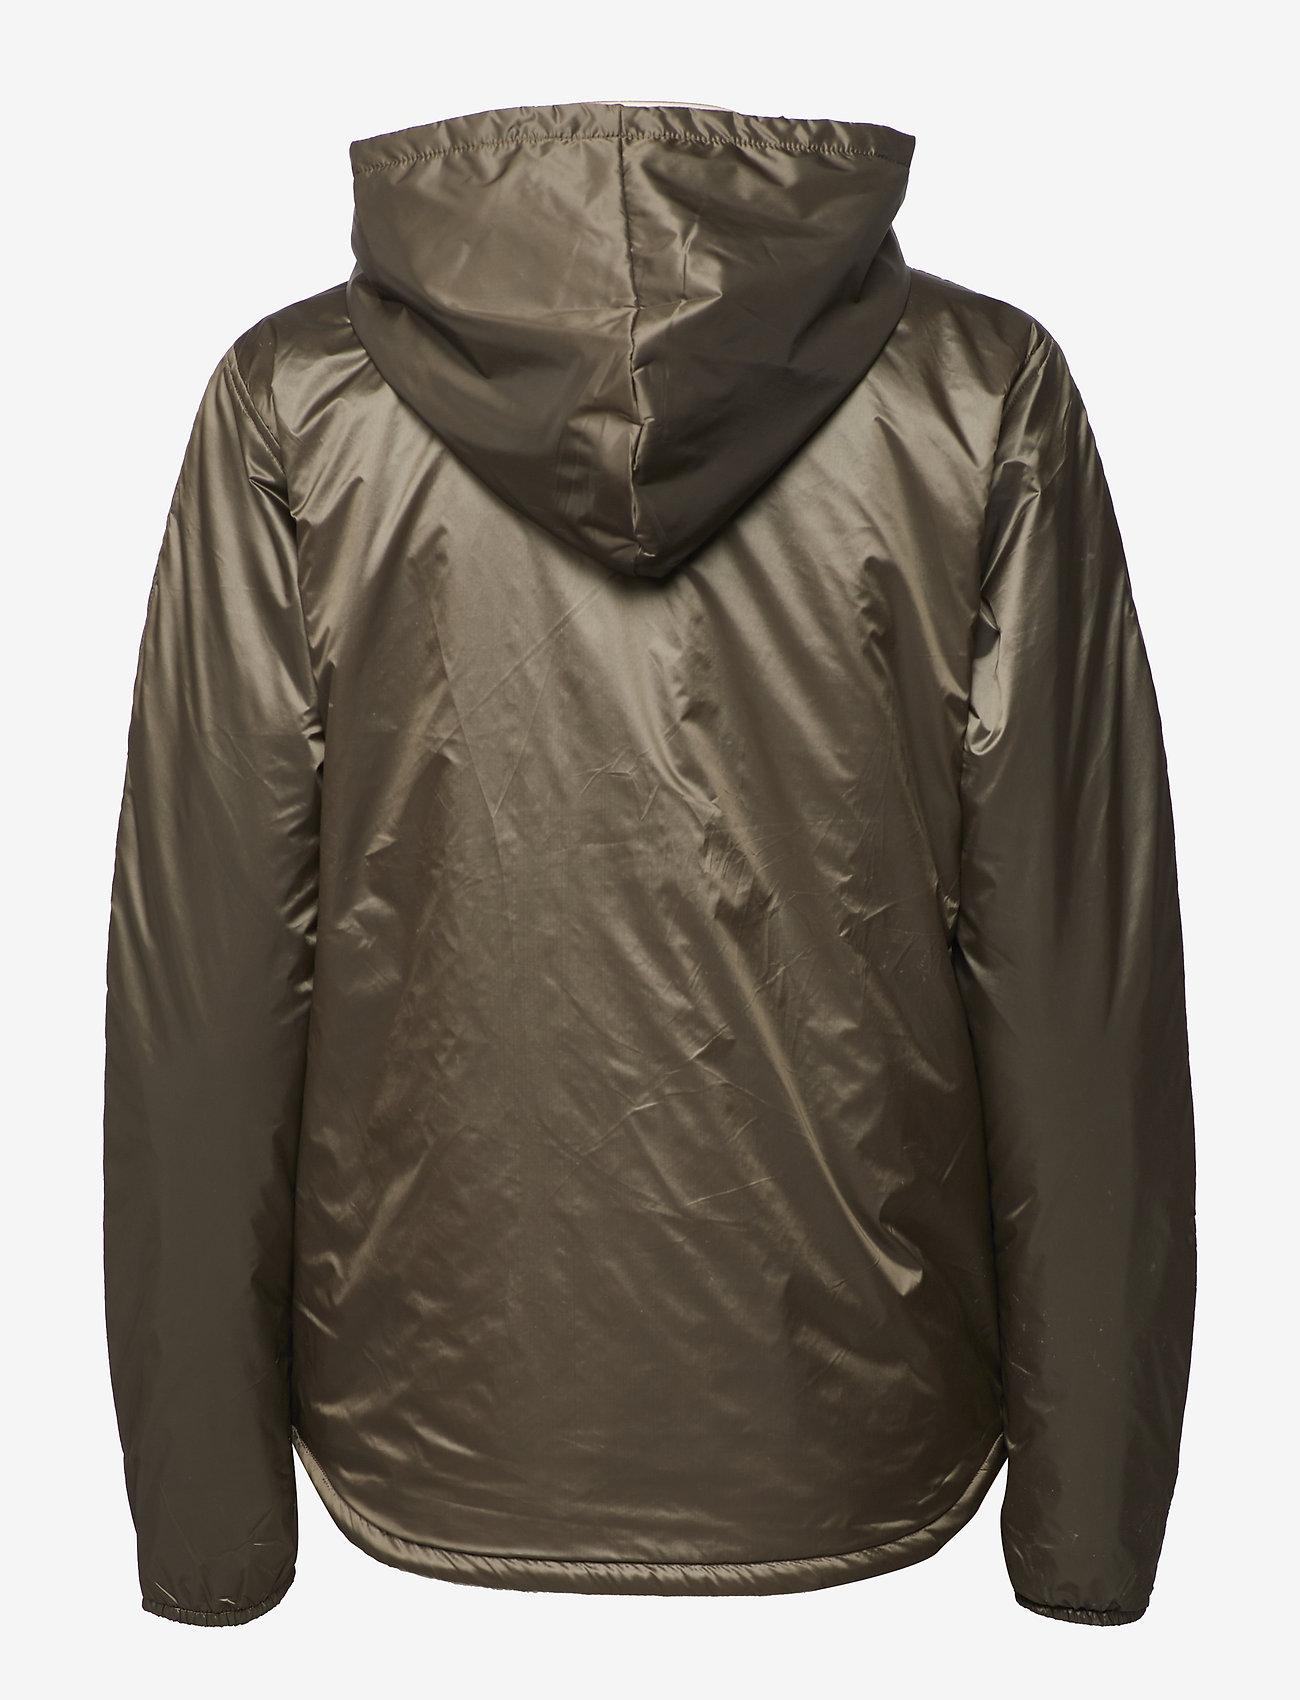 Thermolite Jacket (Olive) (275 €) - Filippa K Soft Sport 2bQa2J1P